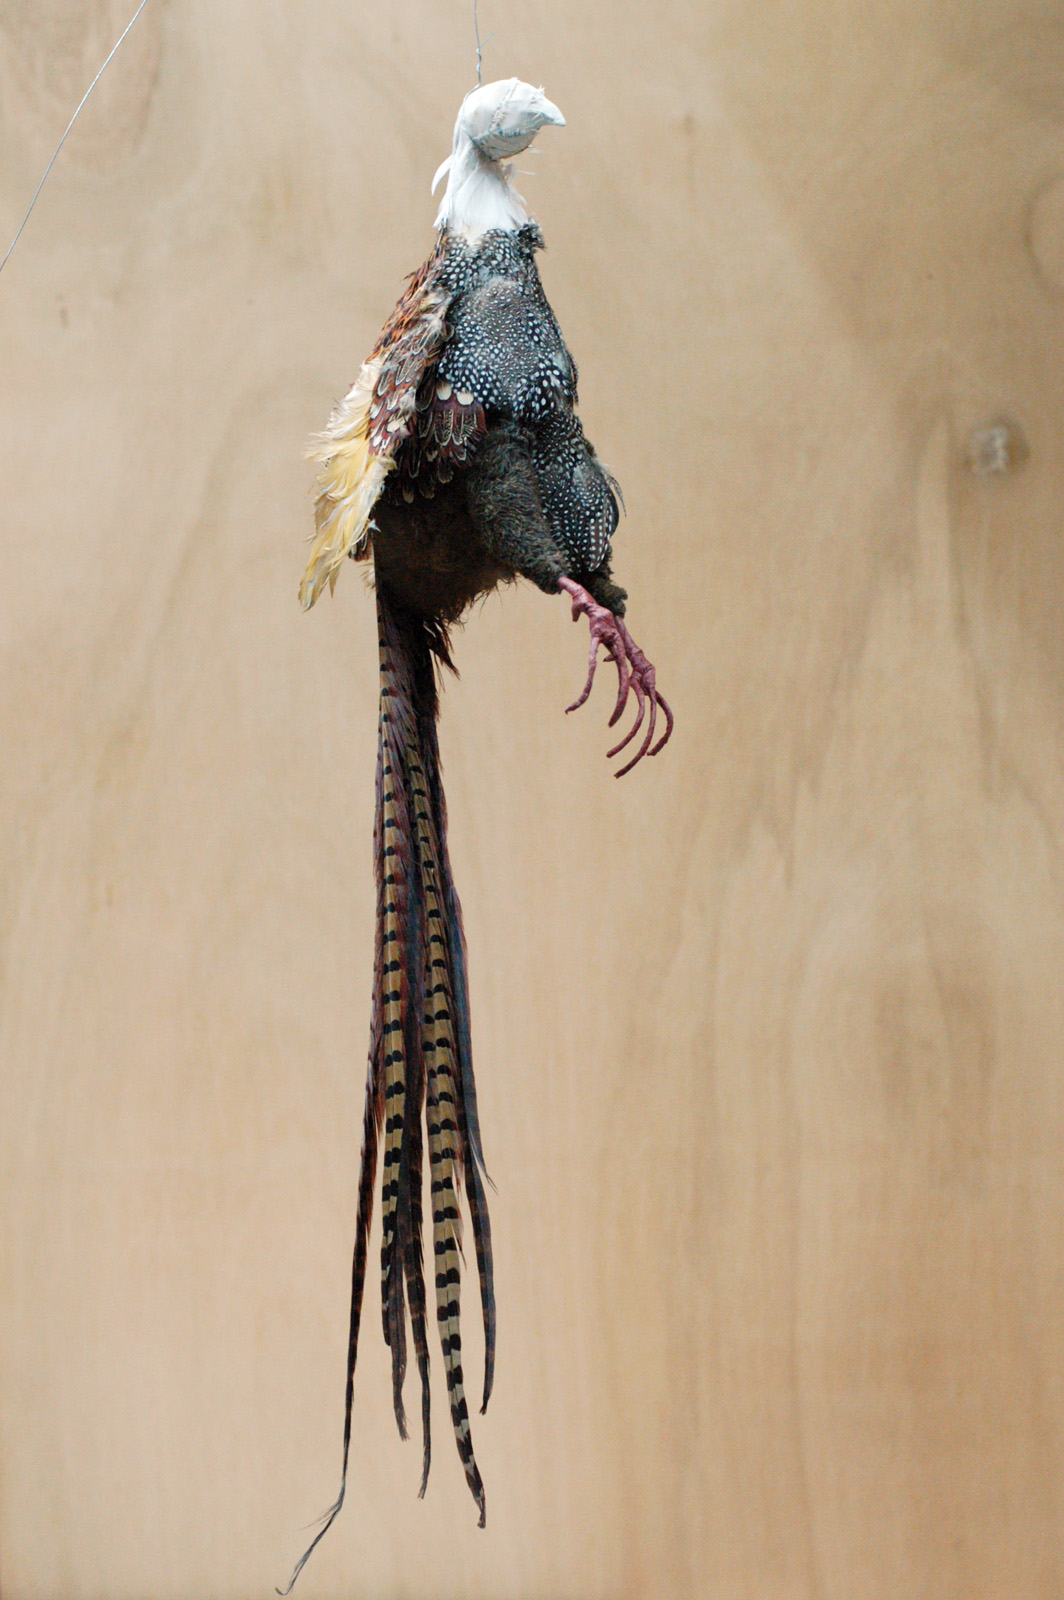 Full-length pheasant near completion